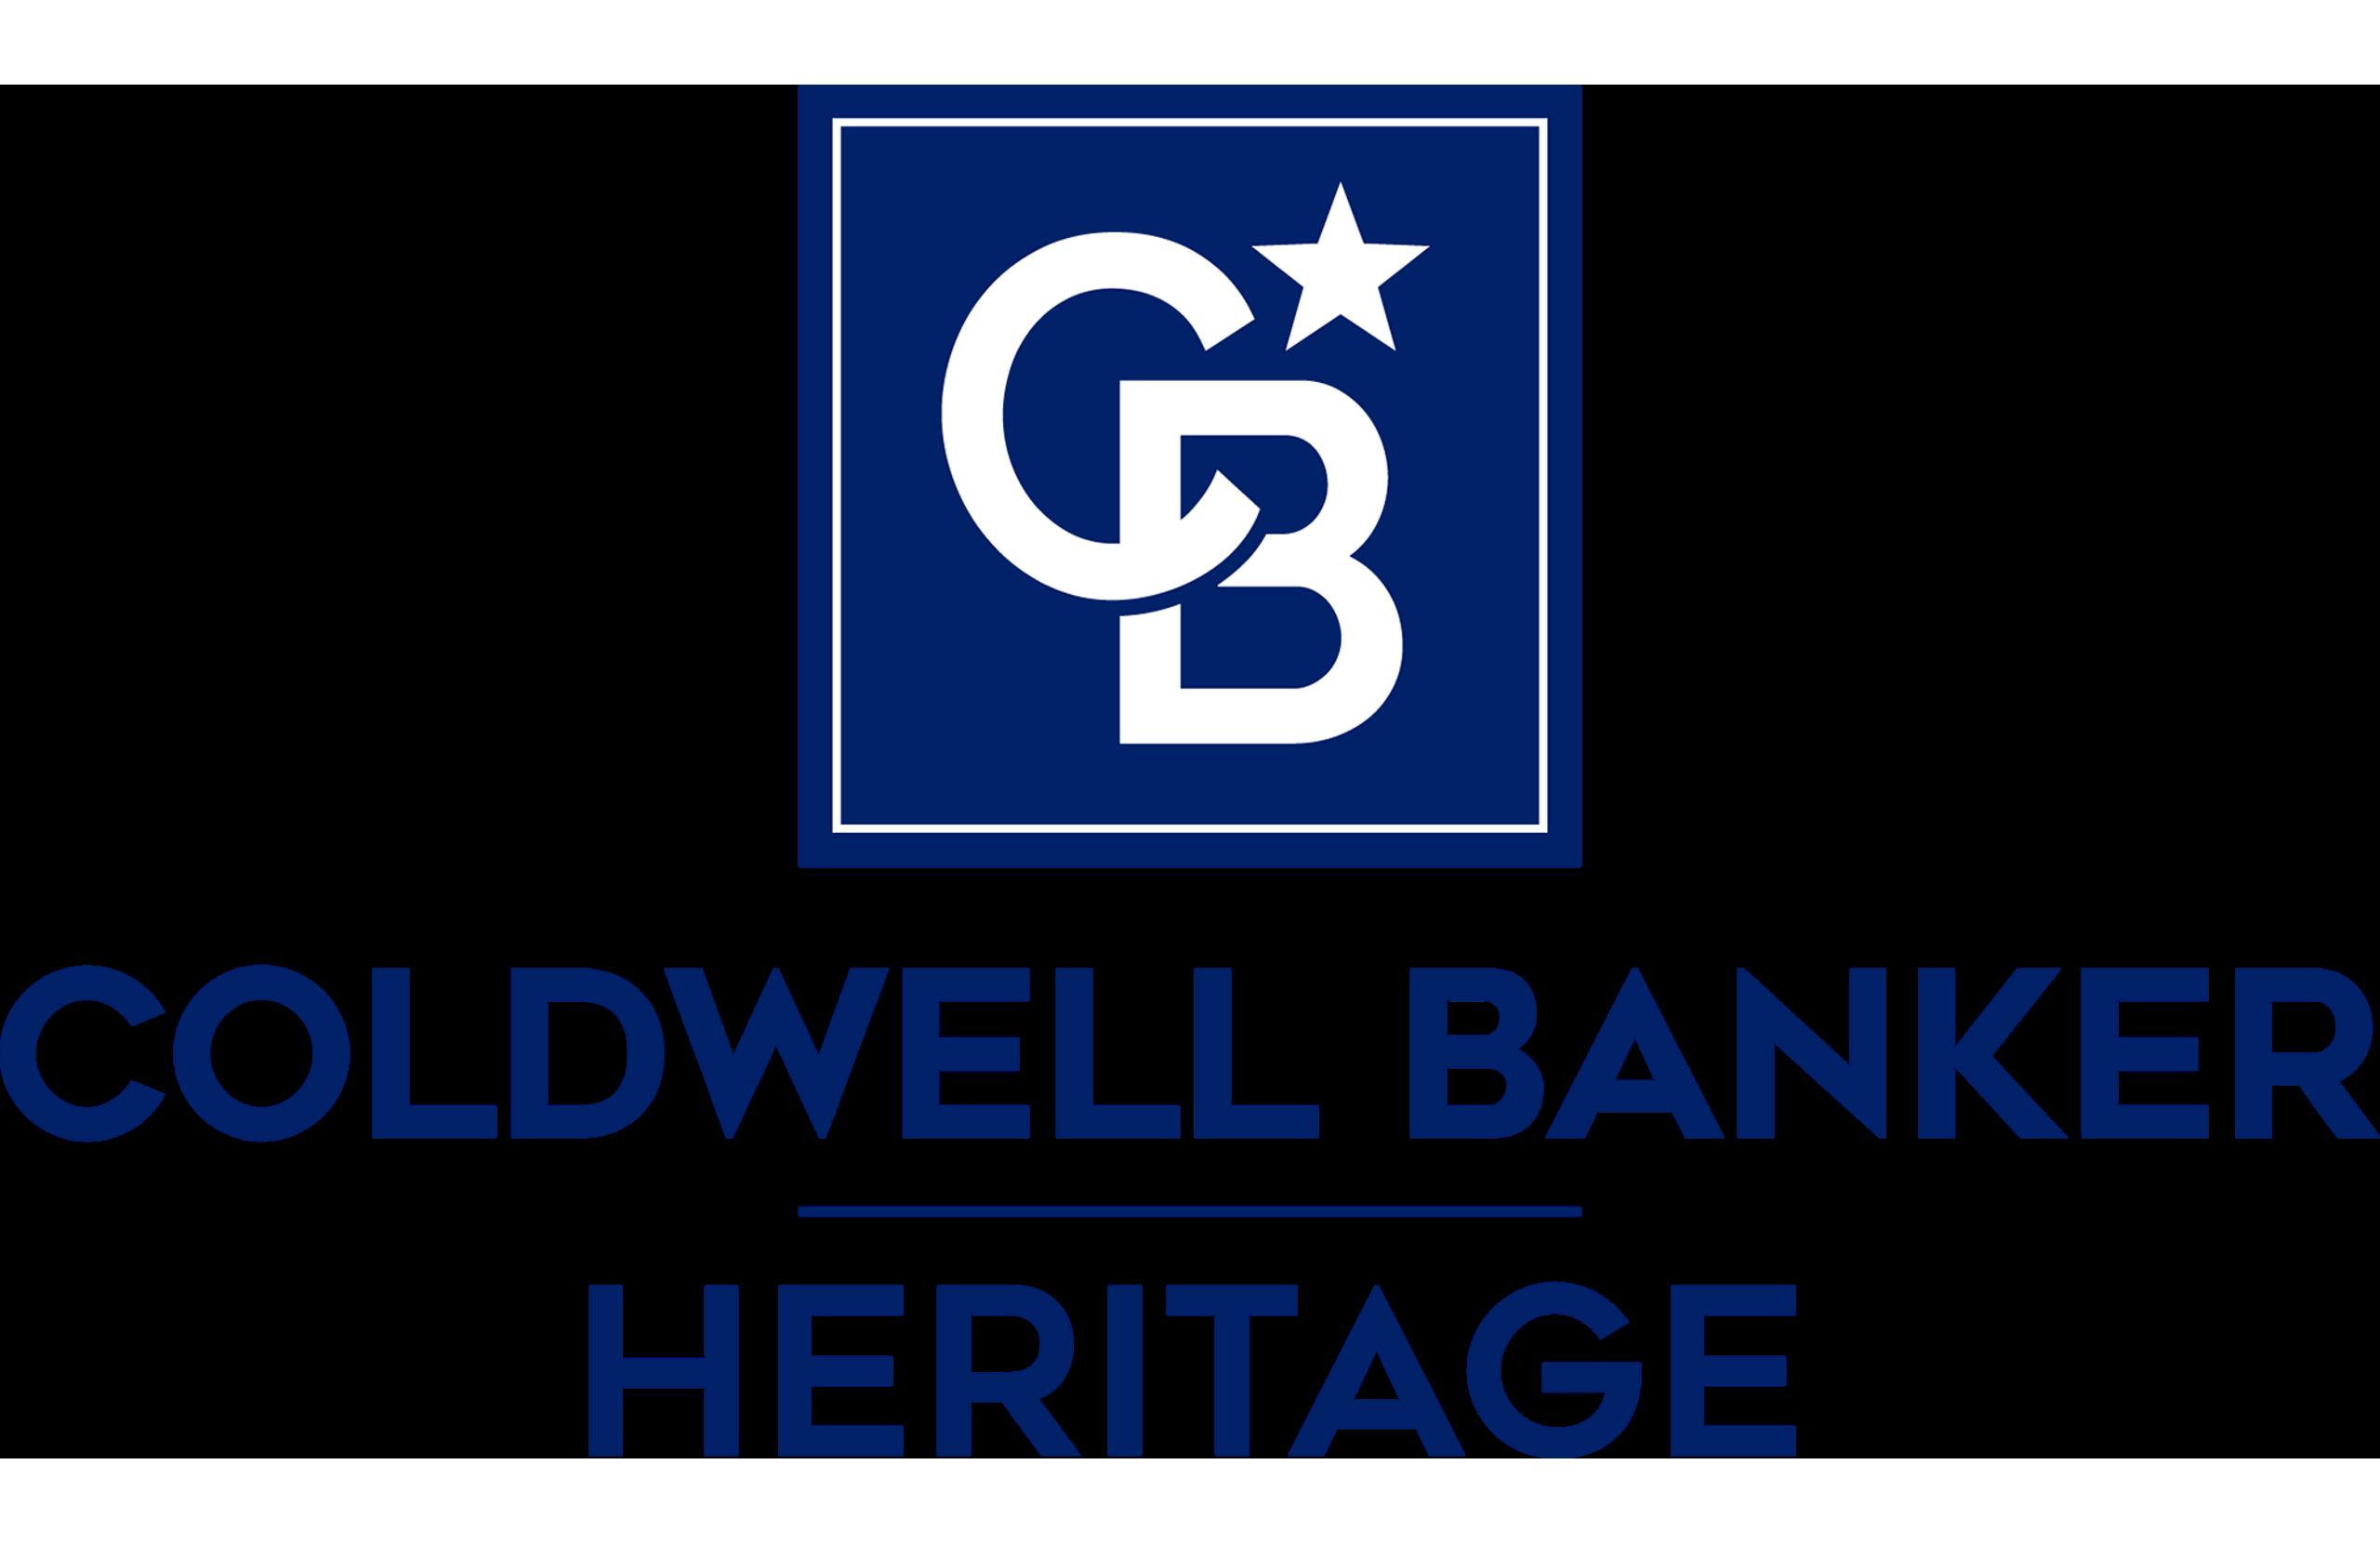 Karen Mowery - Coldwell Banker Heritage Logo